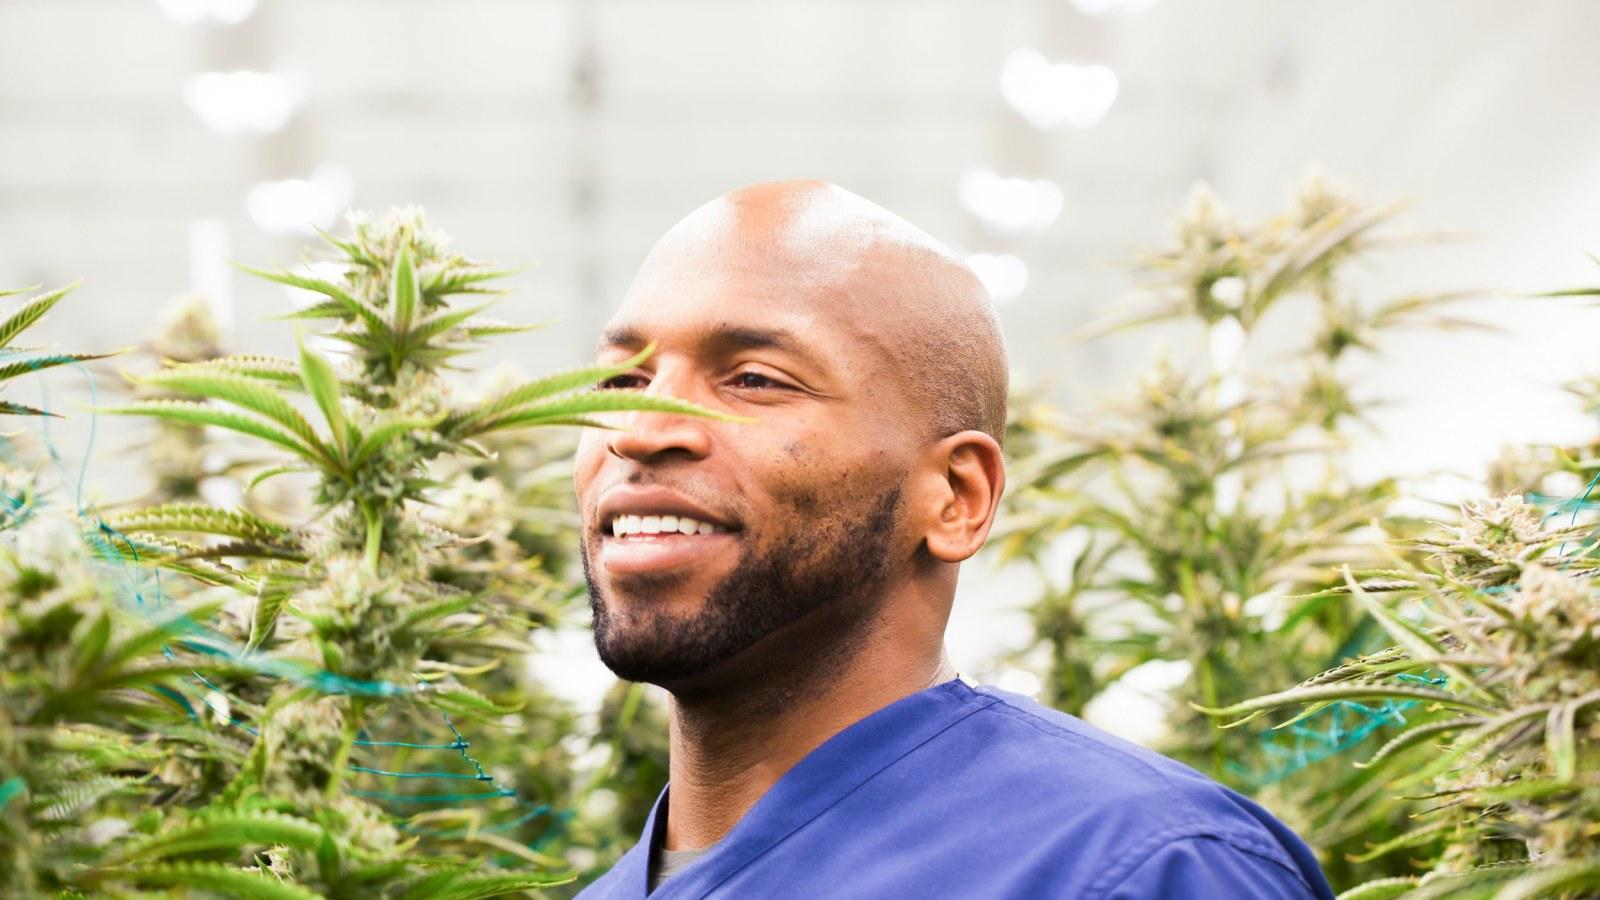 eugene monroe cannabis terapeutica nfl